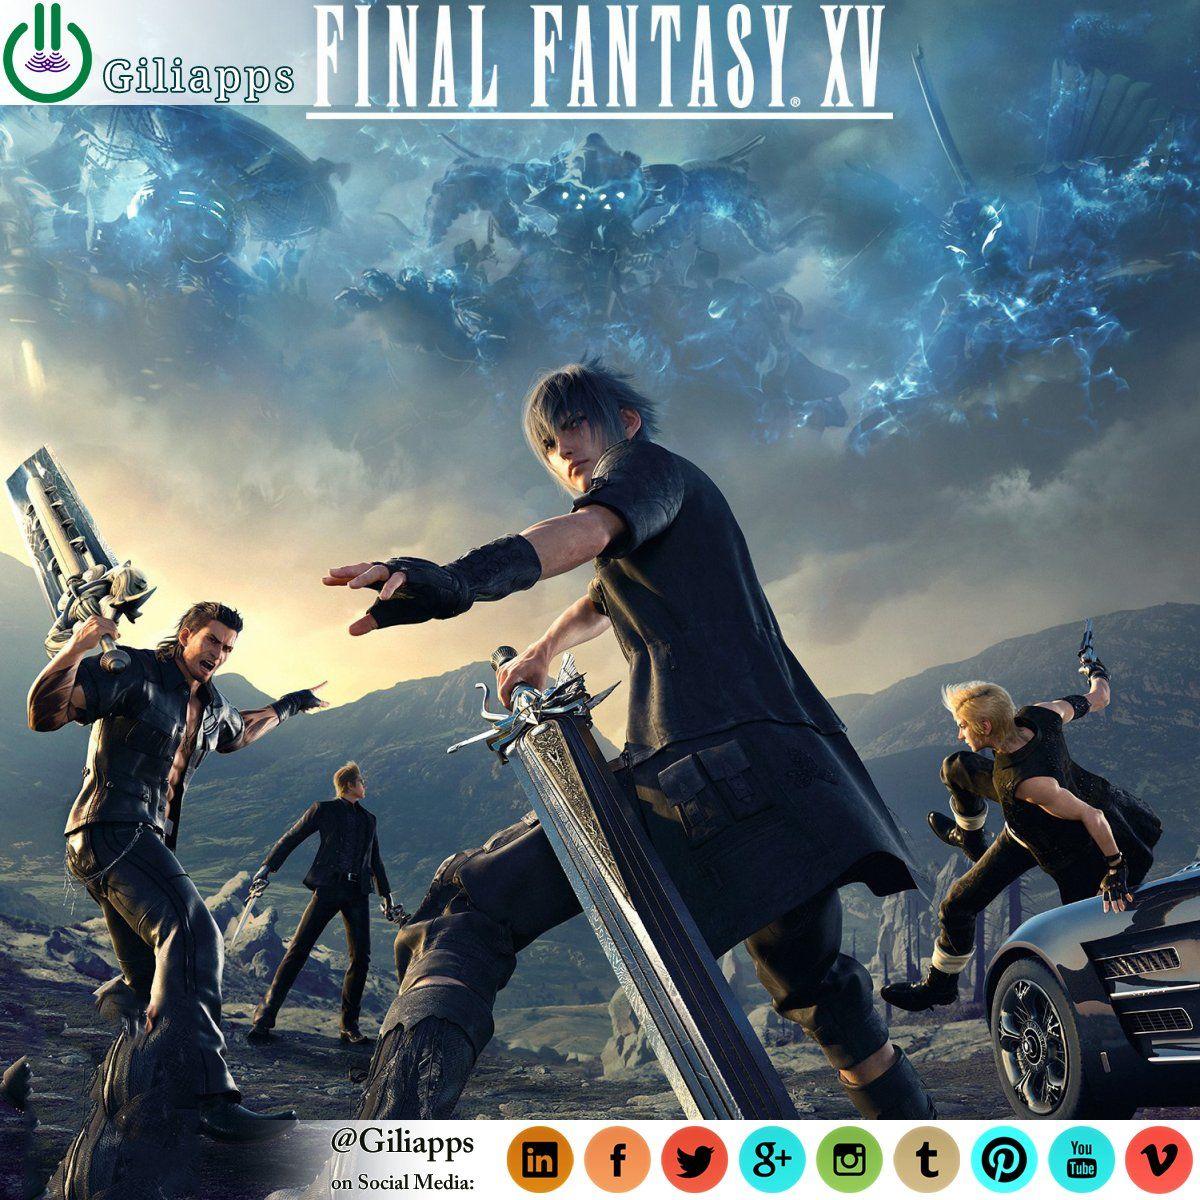 Final Fantasy Xv Pc Kommer Slappa Pa 06 Mar 2018 Final Fantasy